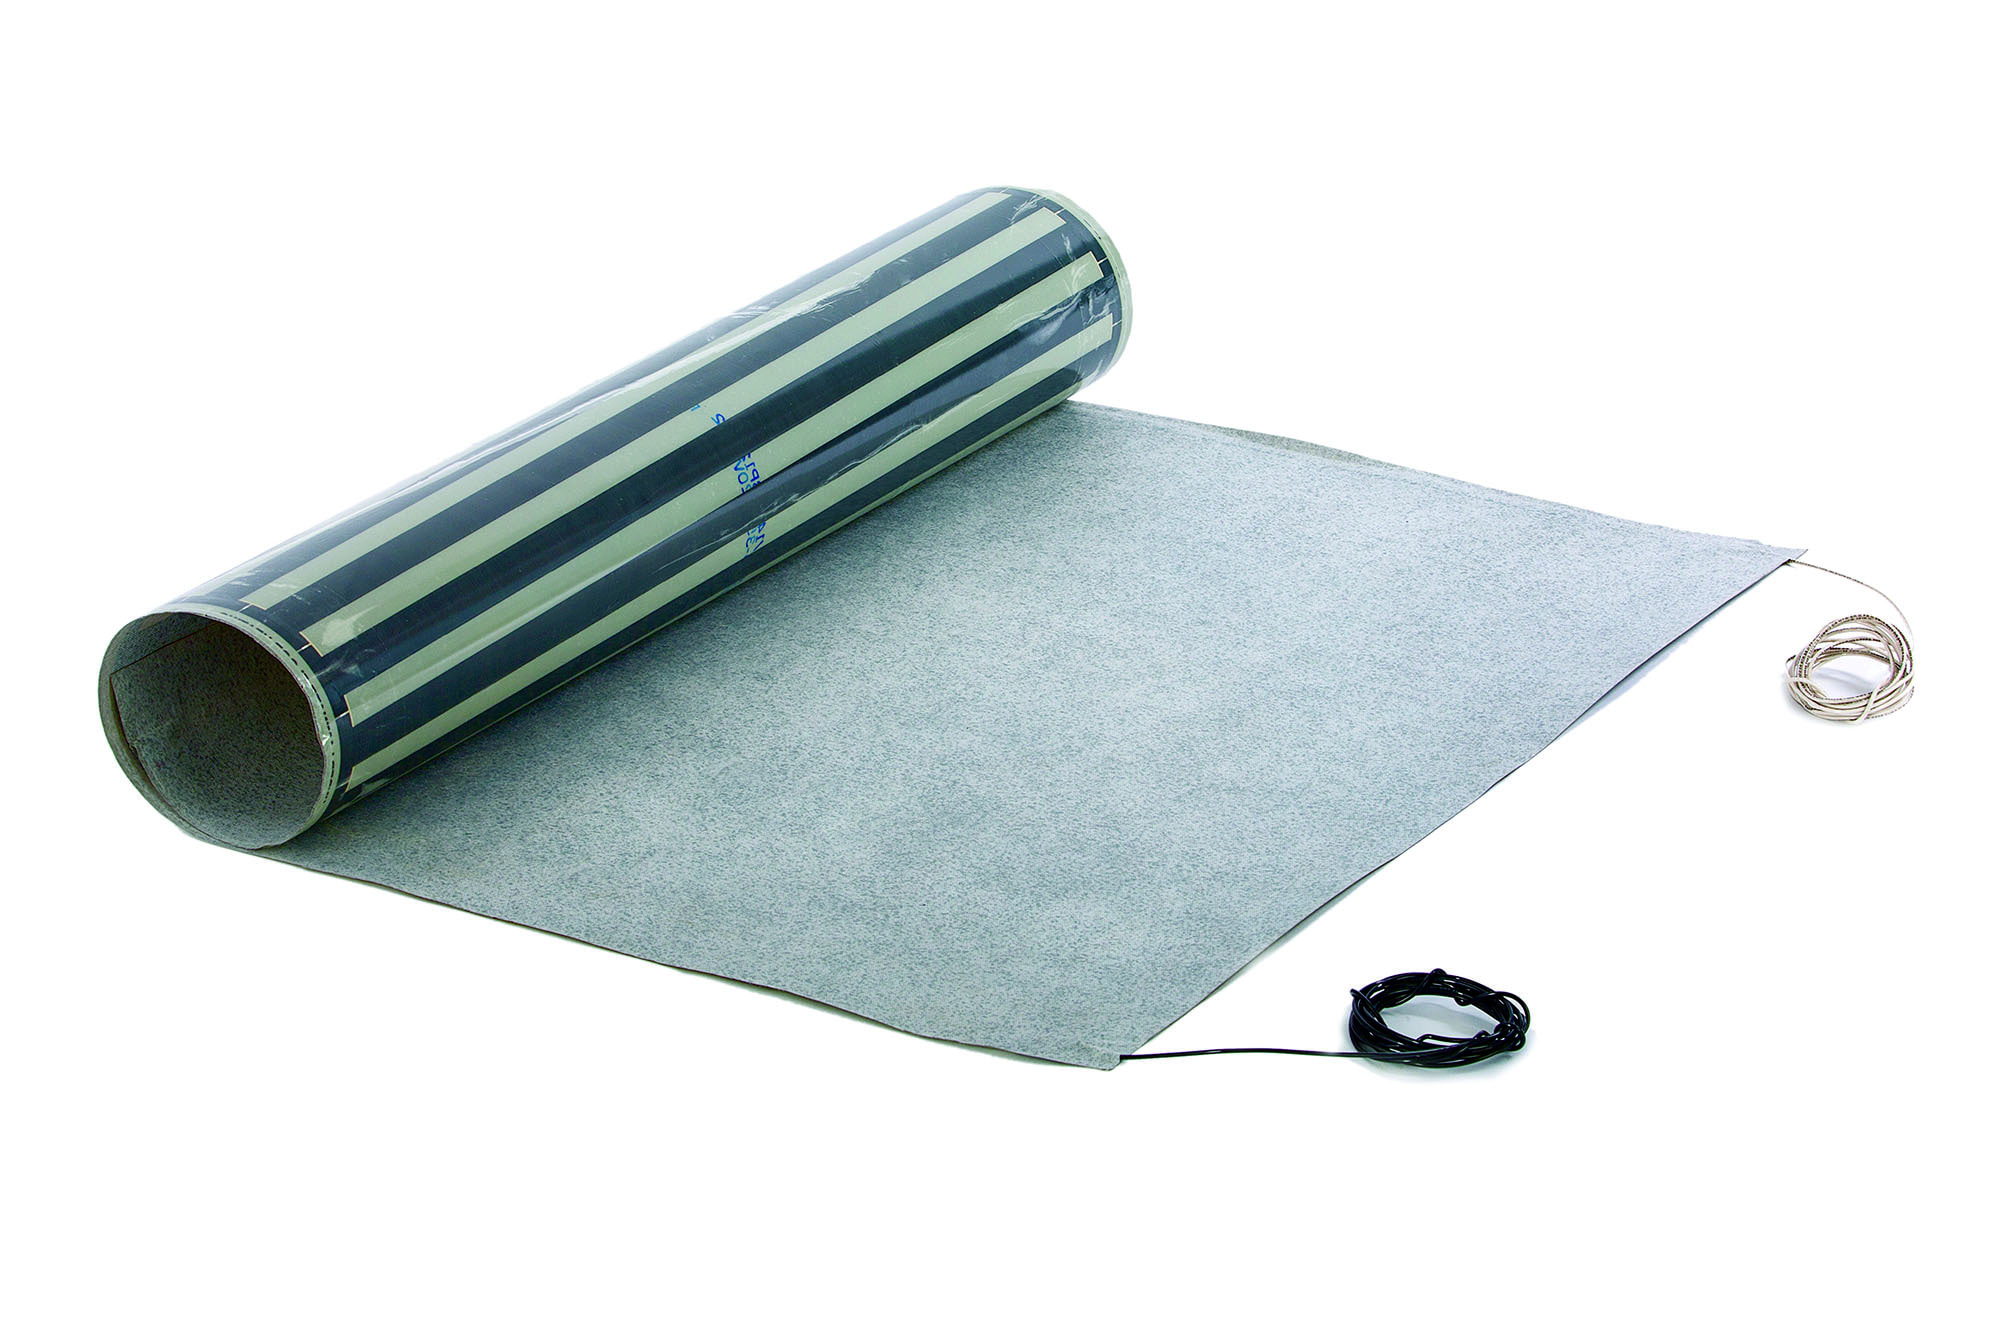 Quiet warmth underfloor heating tile floor heating 240v 3x5 dailygadgetfo Choice Image